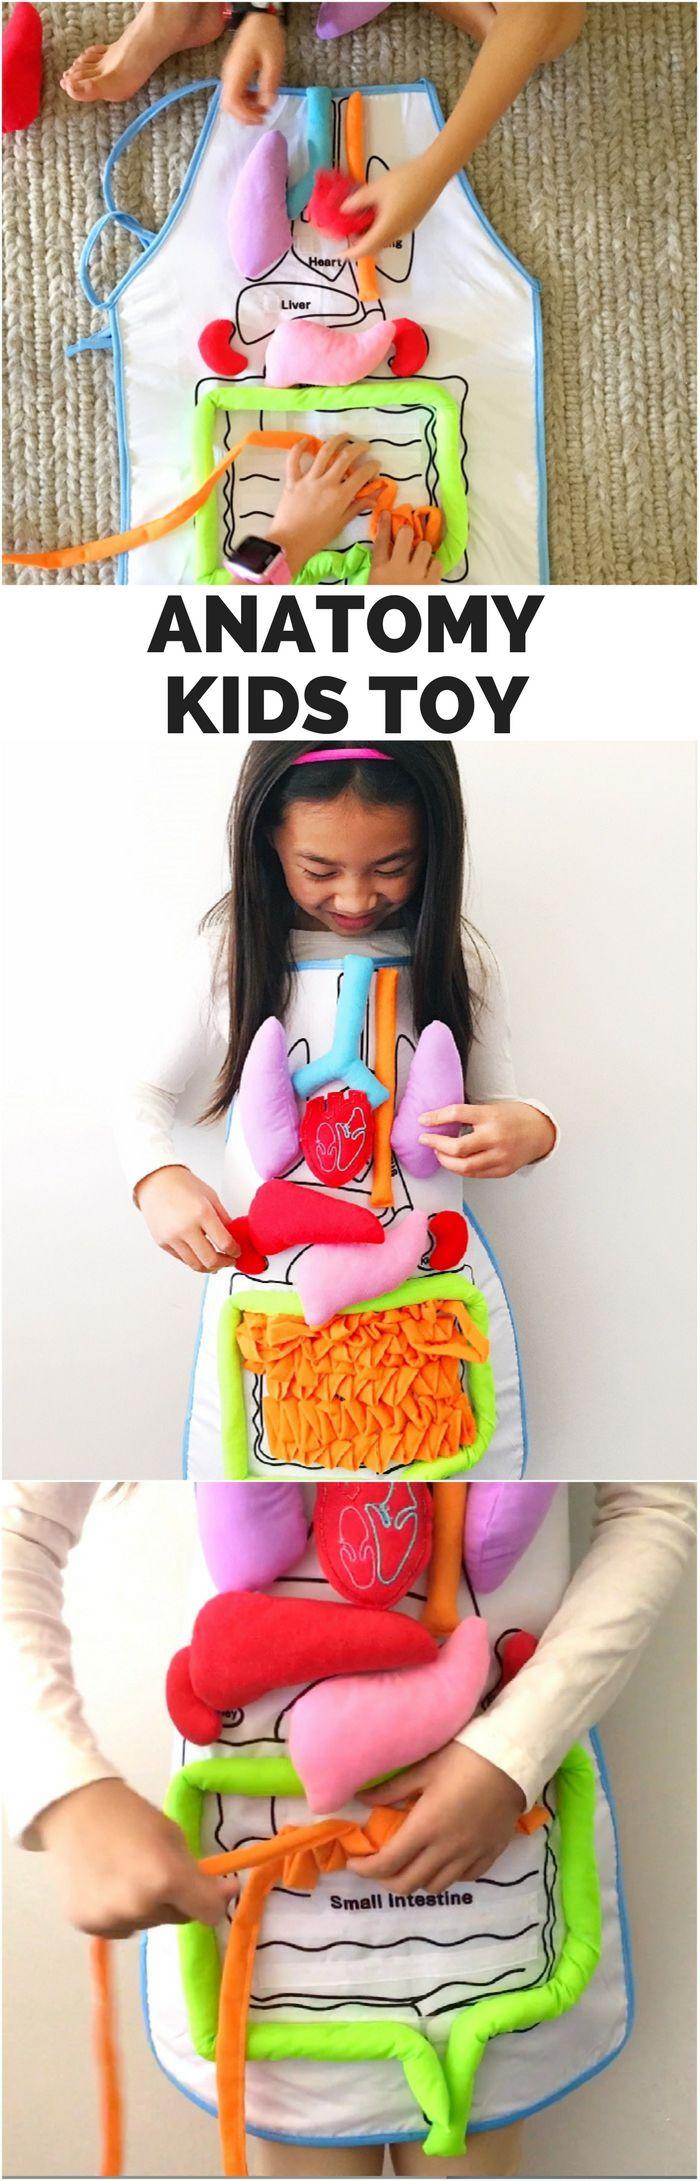 Fun Anatomy Apron Toy for Kids #anatomy #learningtoy #kidstoys